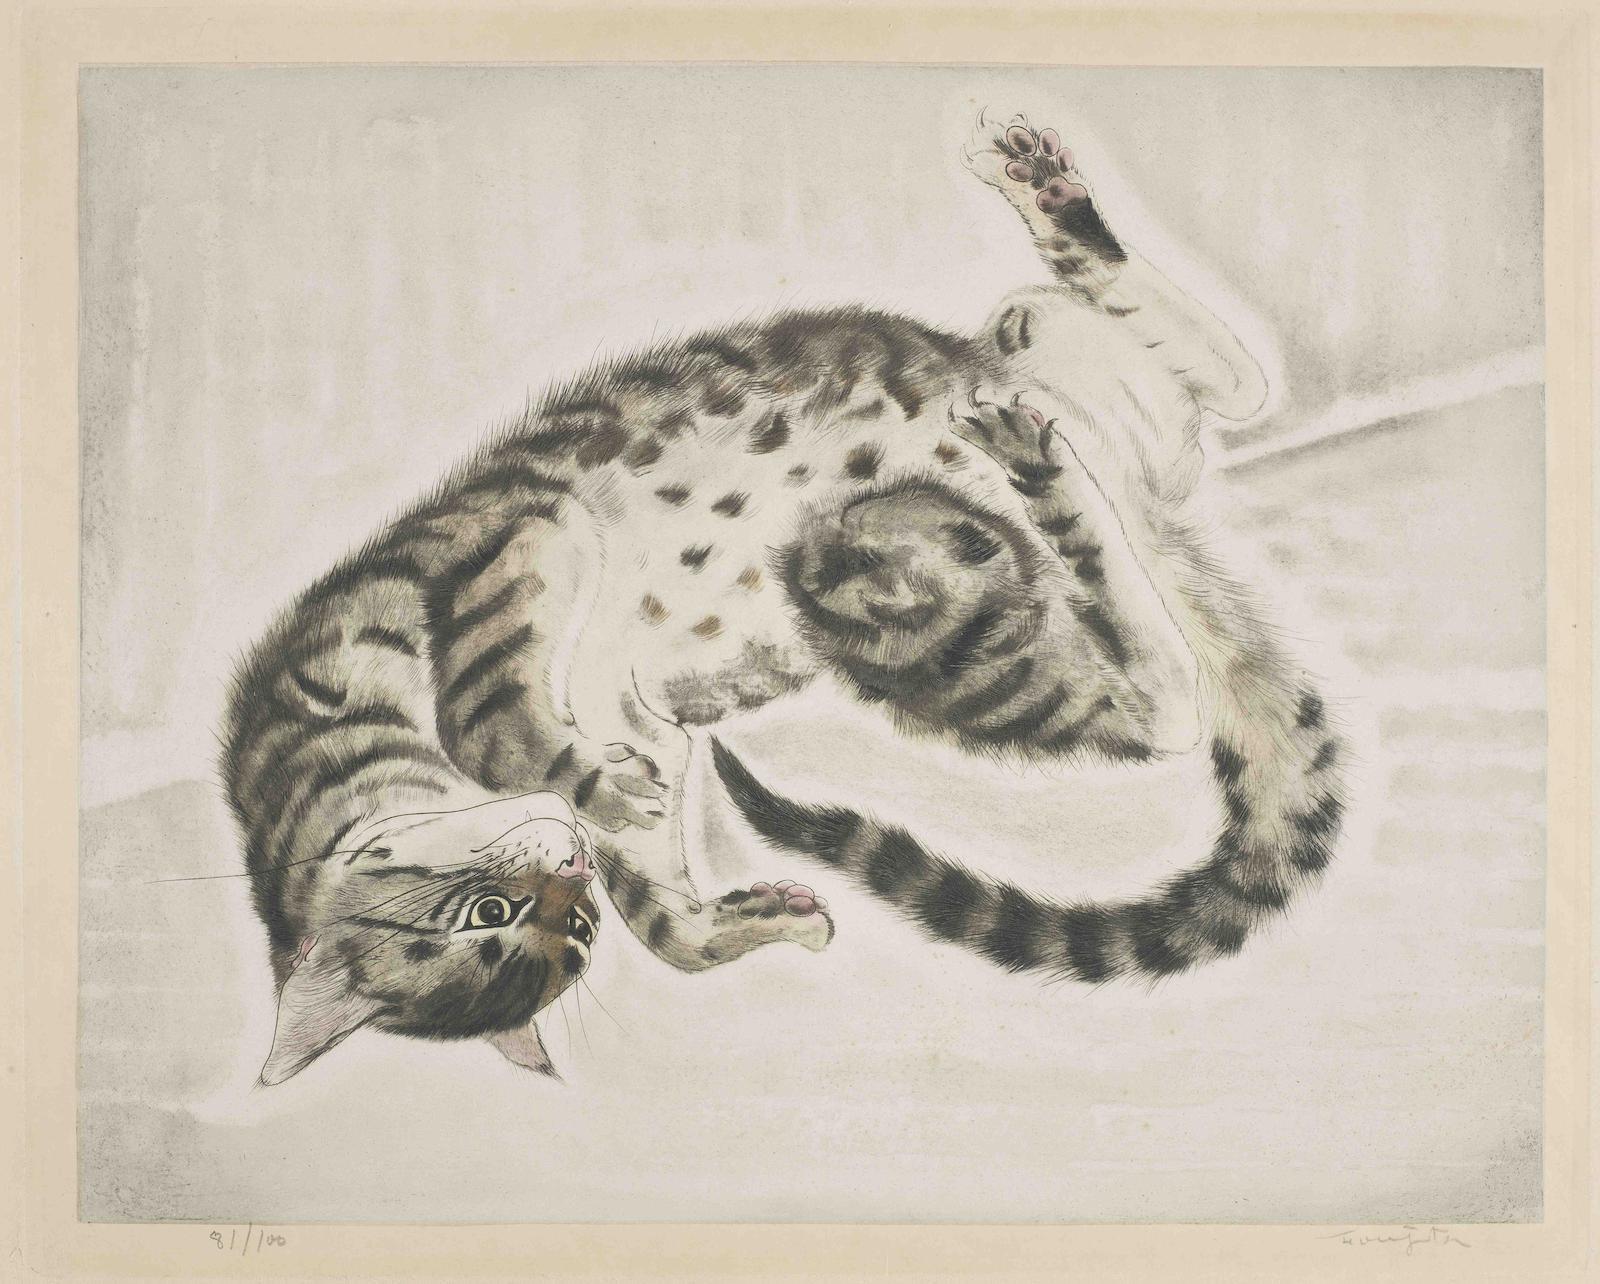 Tsuguharu Foujita-Twisting Cat, from Les Chats (Buisson 29.200.1)-1930